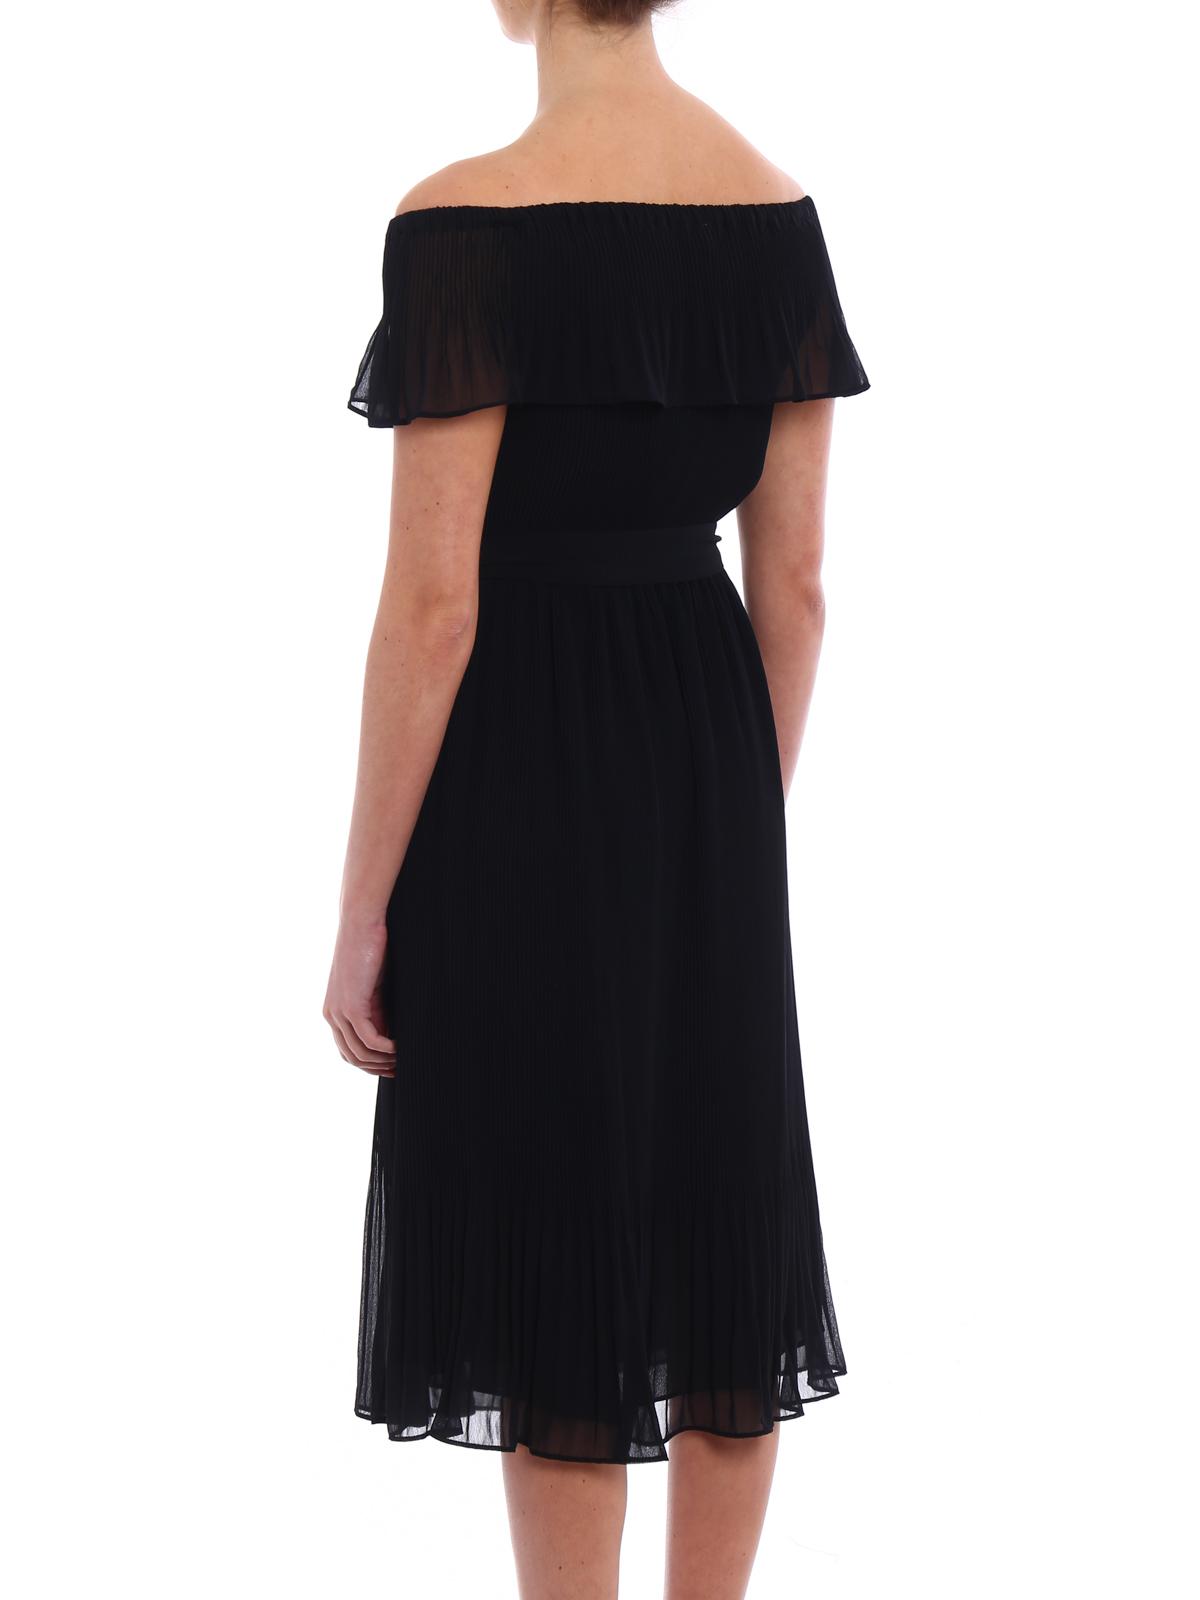 Michael Kors Pleated Chiffon Dress